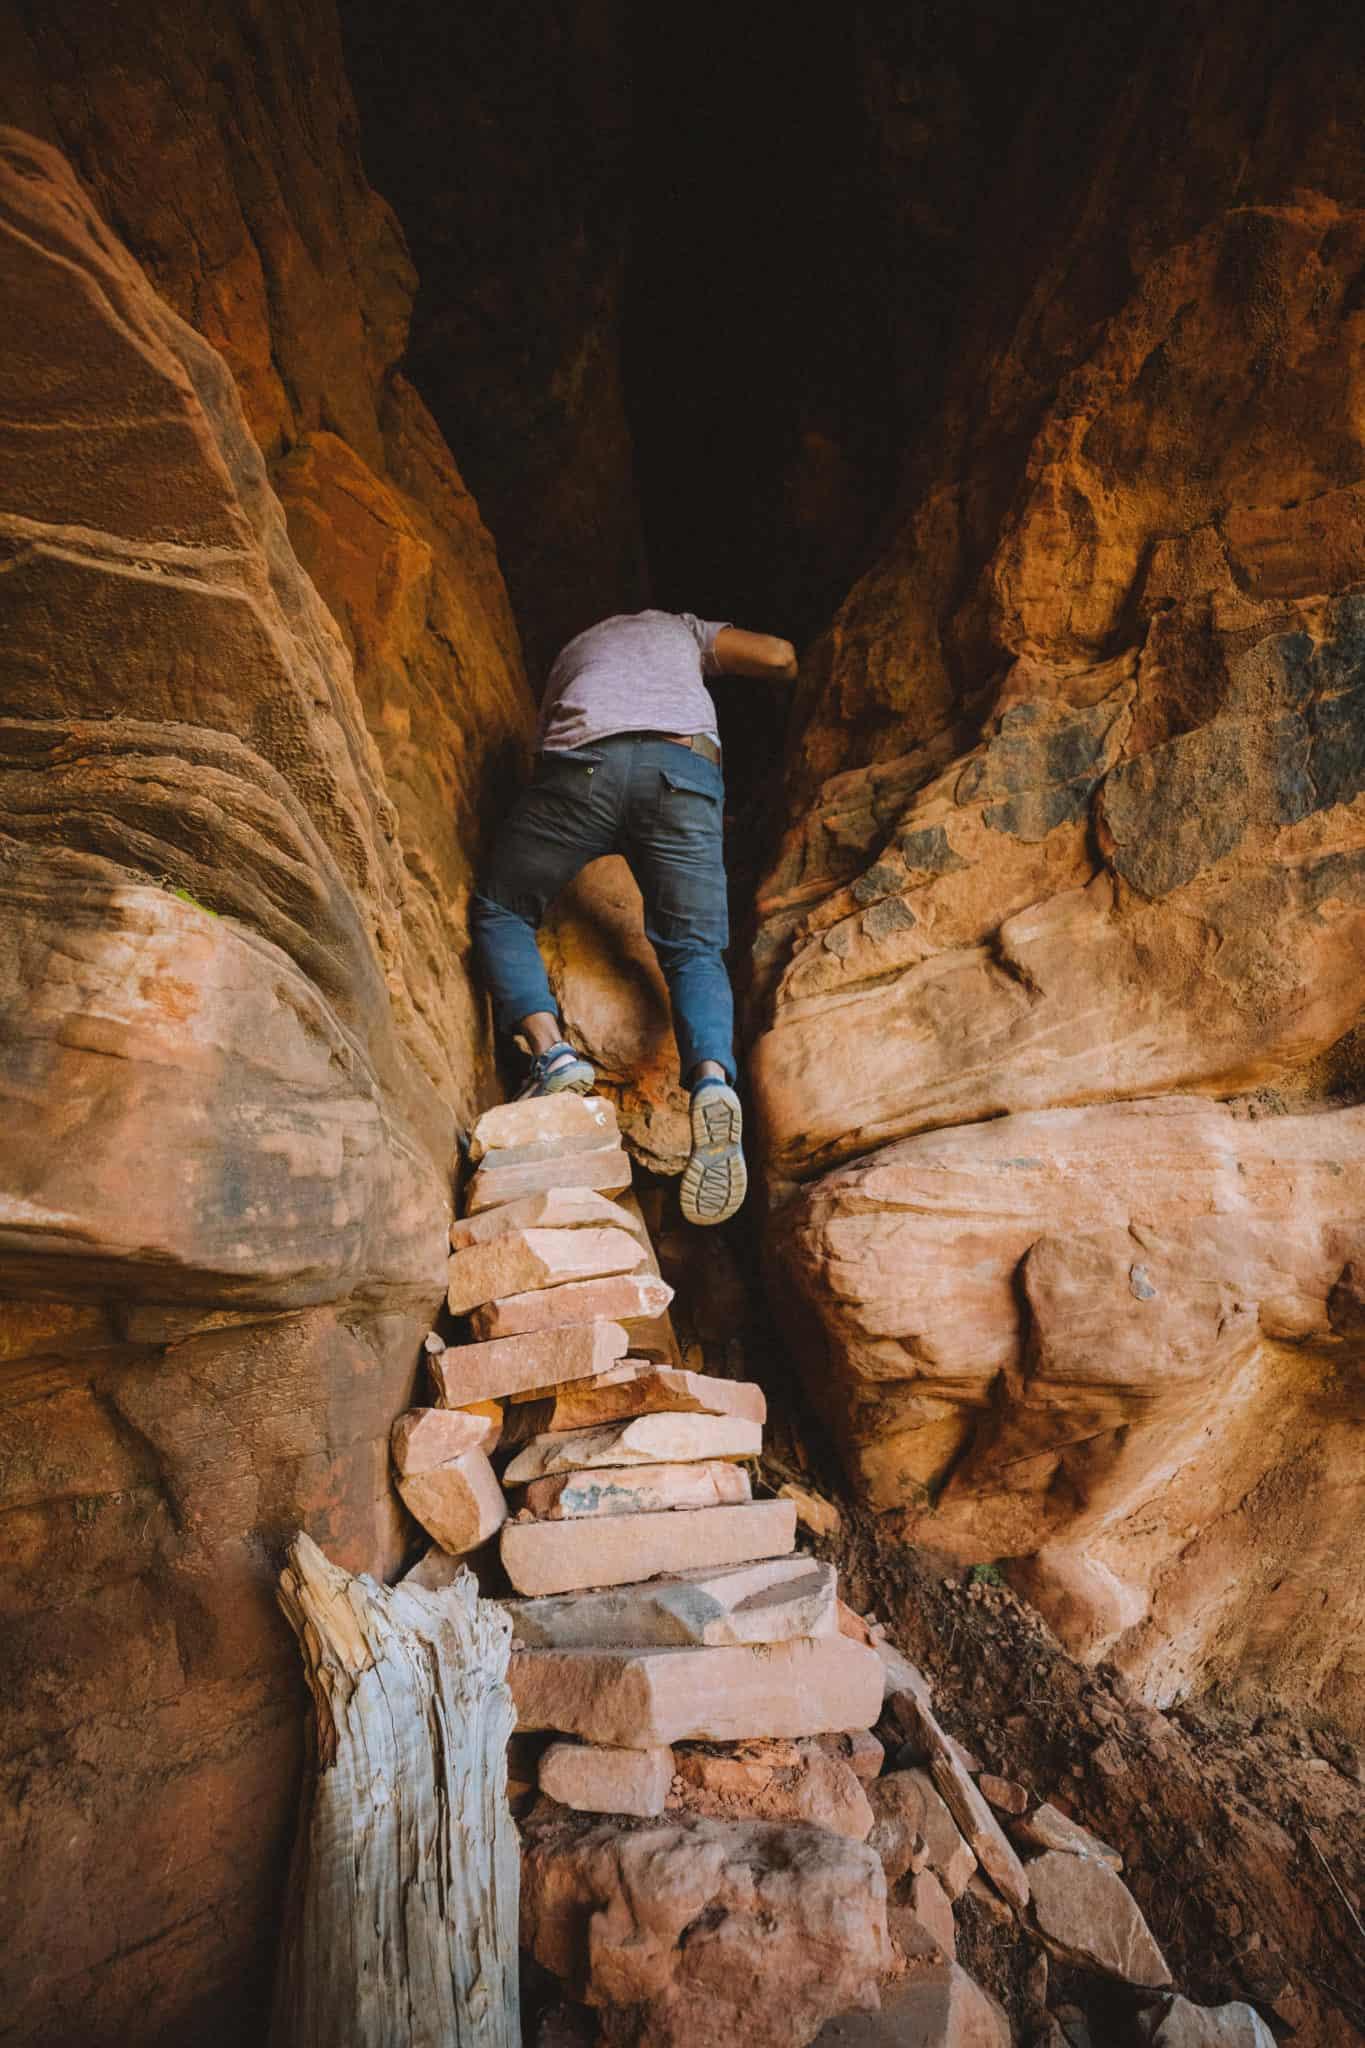 Berty Mandagie climbing into Soldiers Pass cave, Sedona